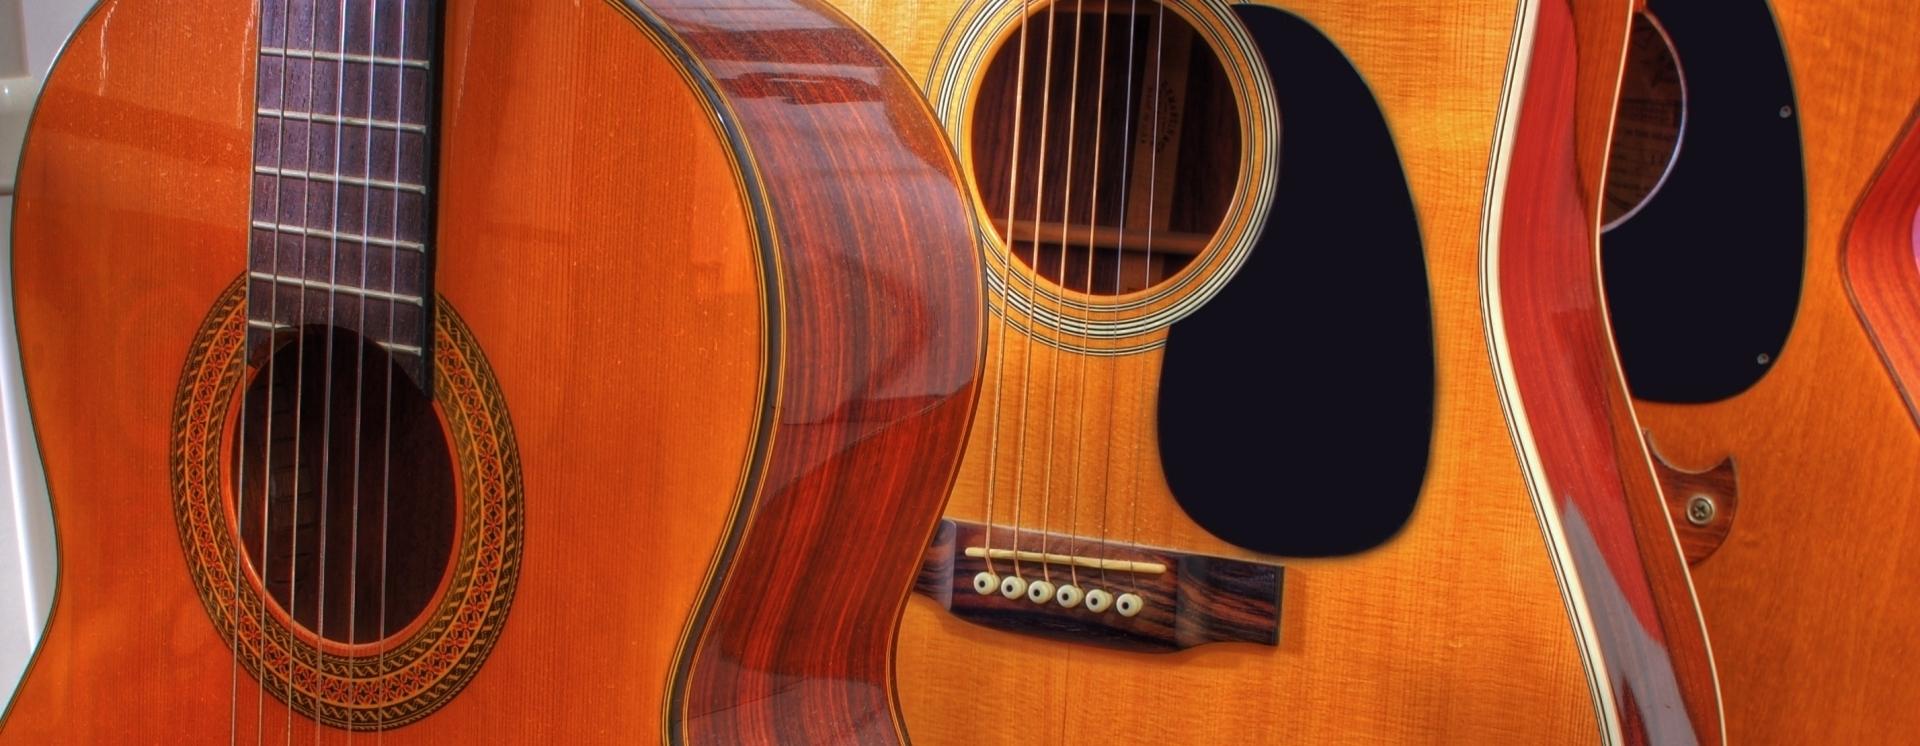 1451416161 song guitars copy